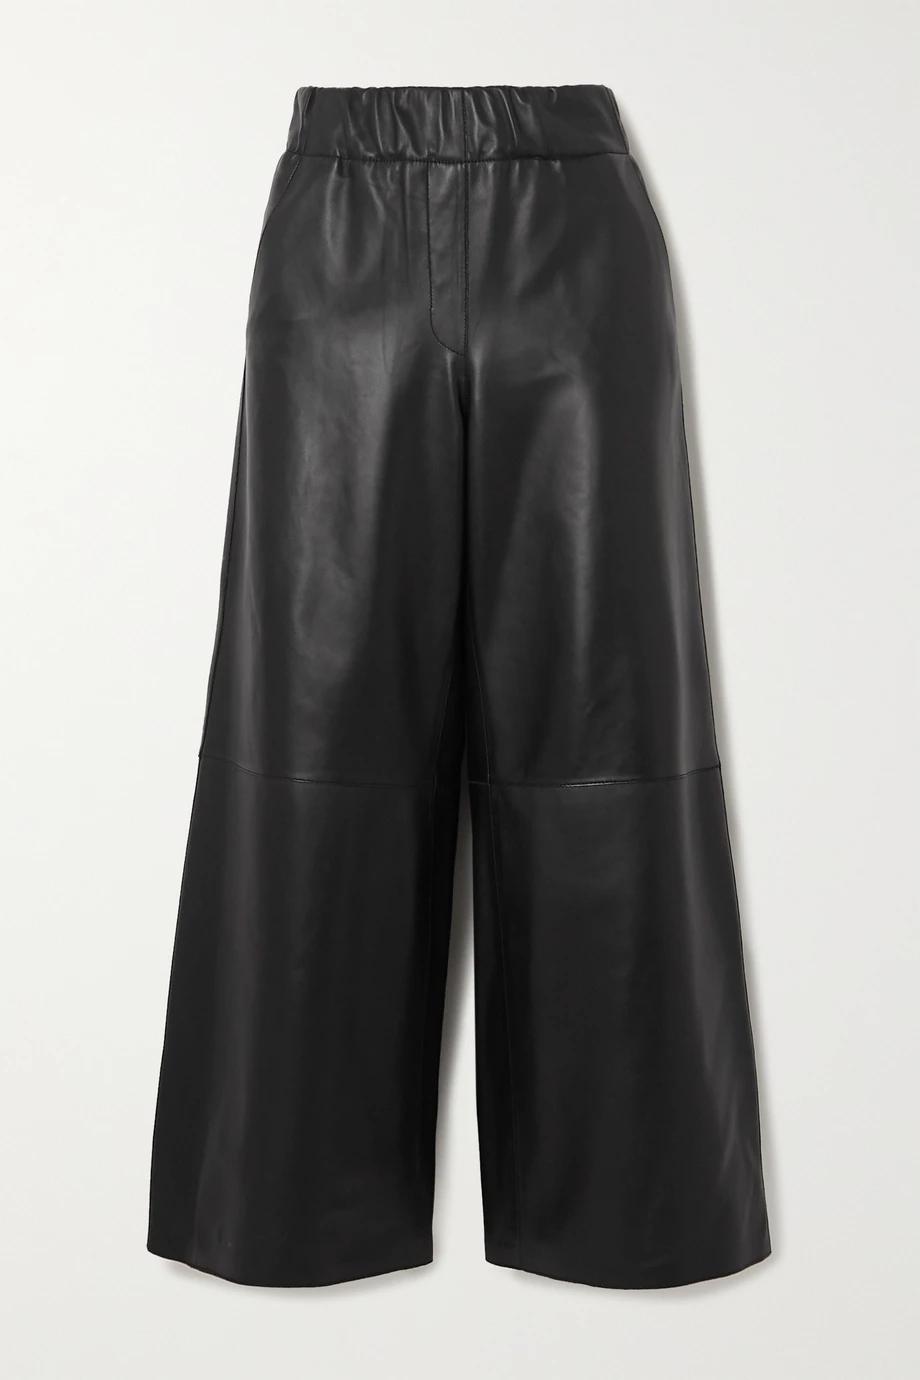 Loewe kožne hlače jogger model 2021.